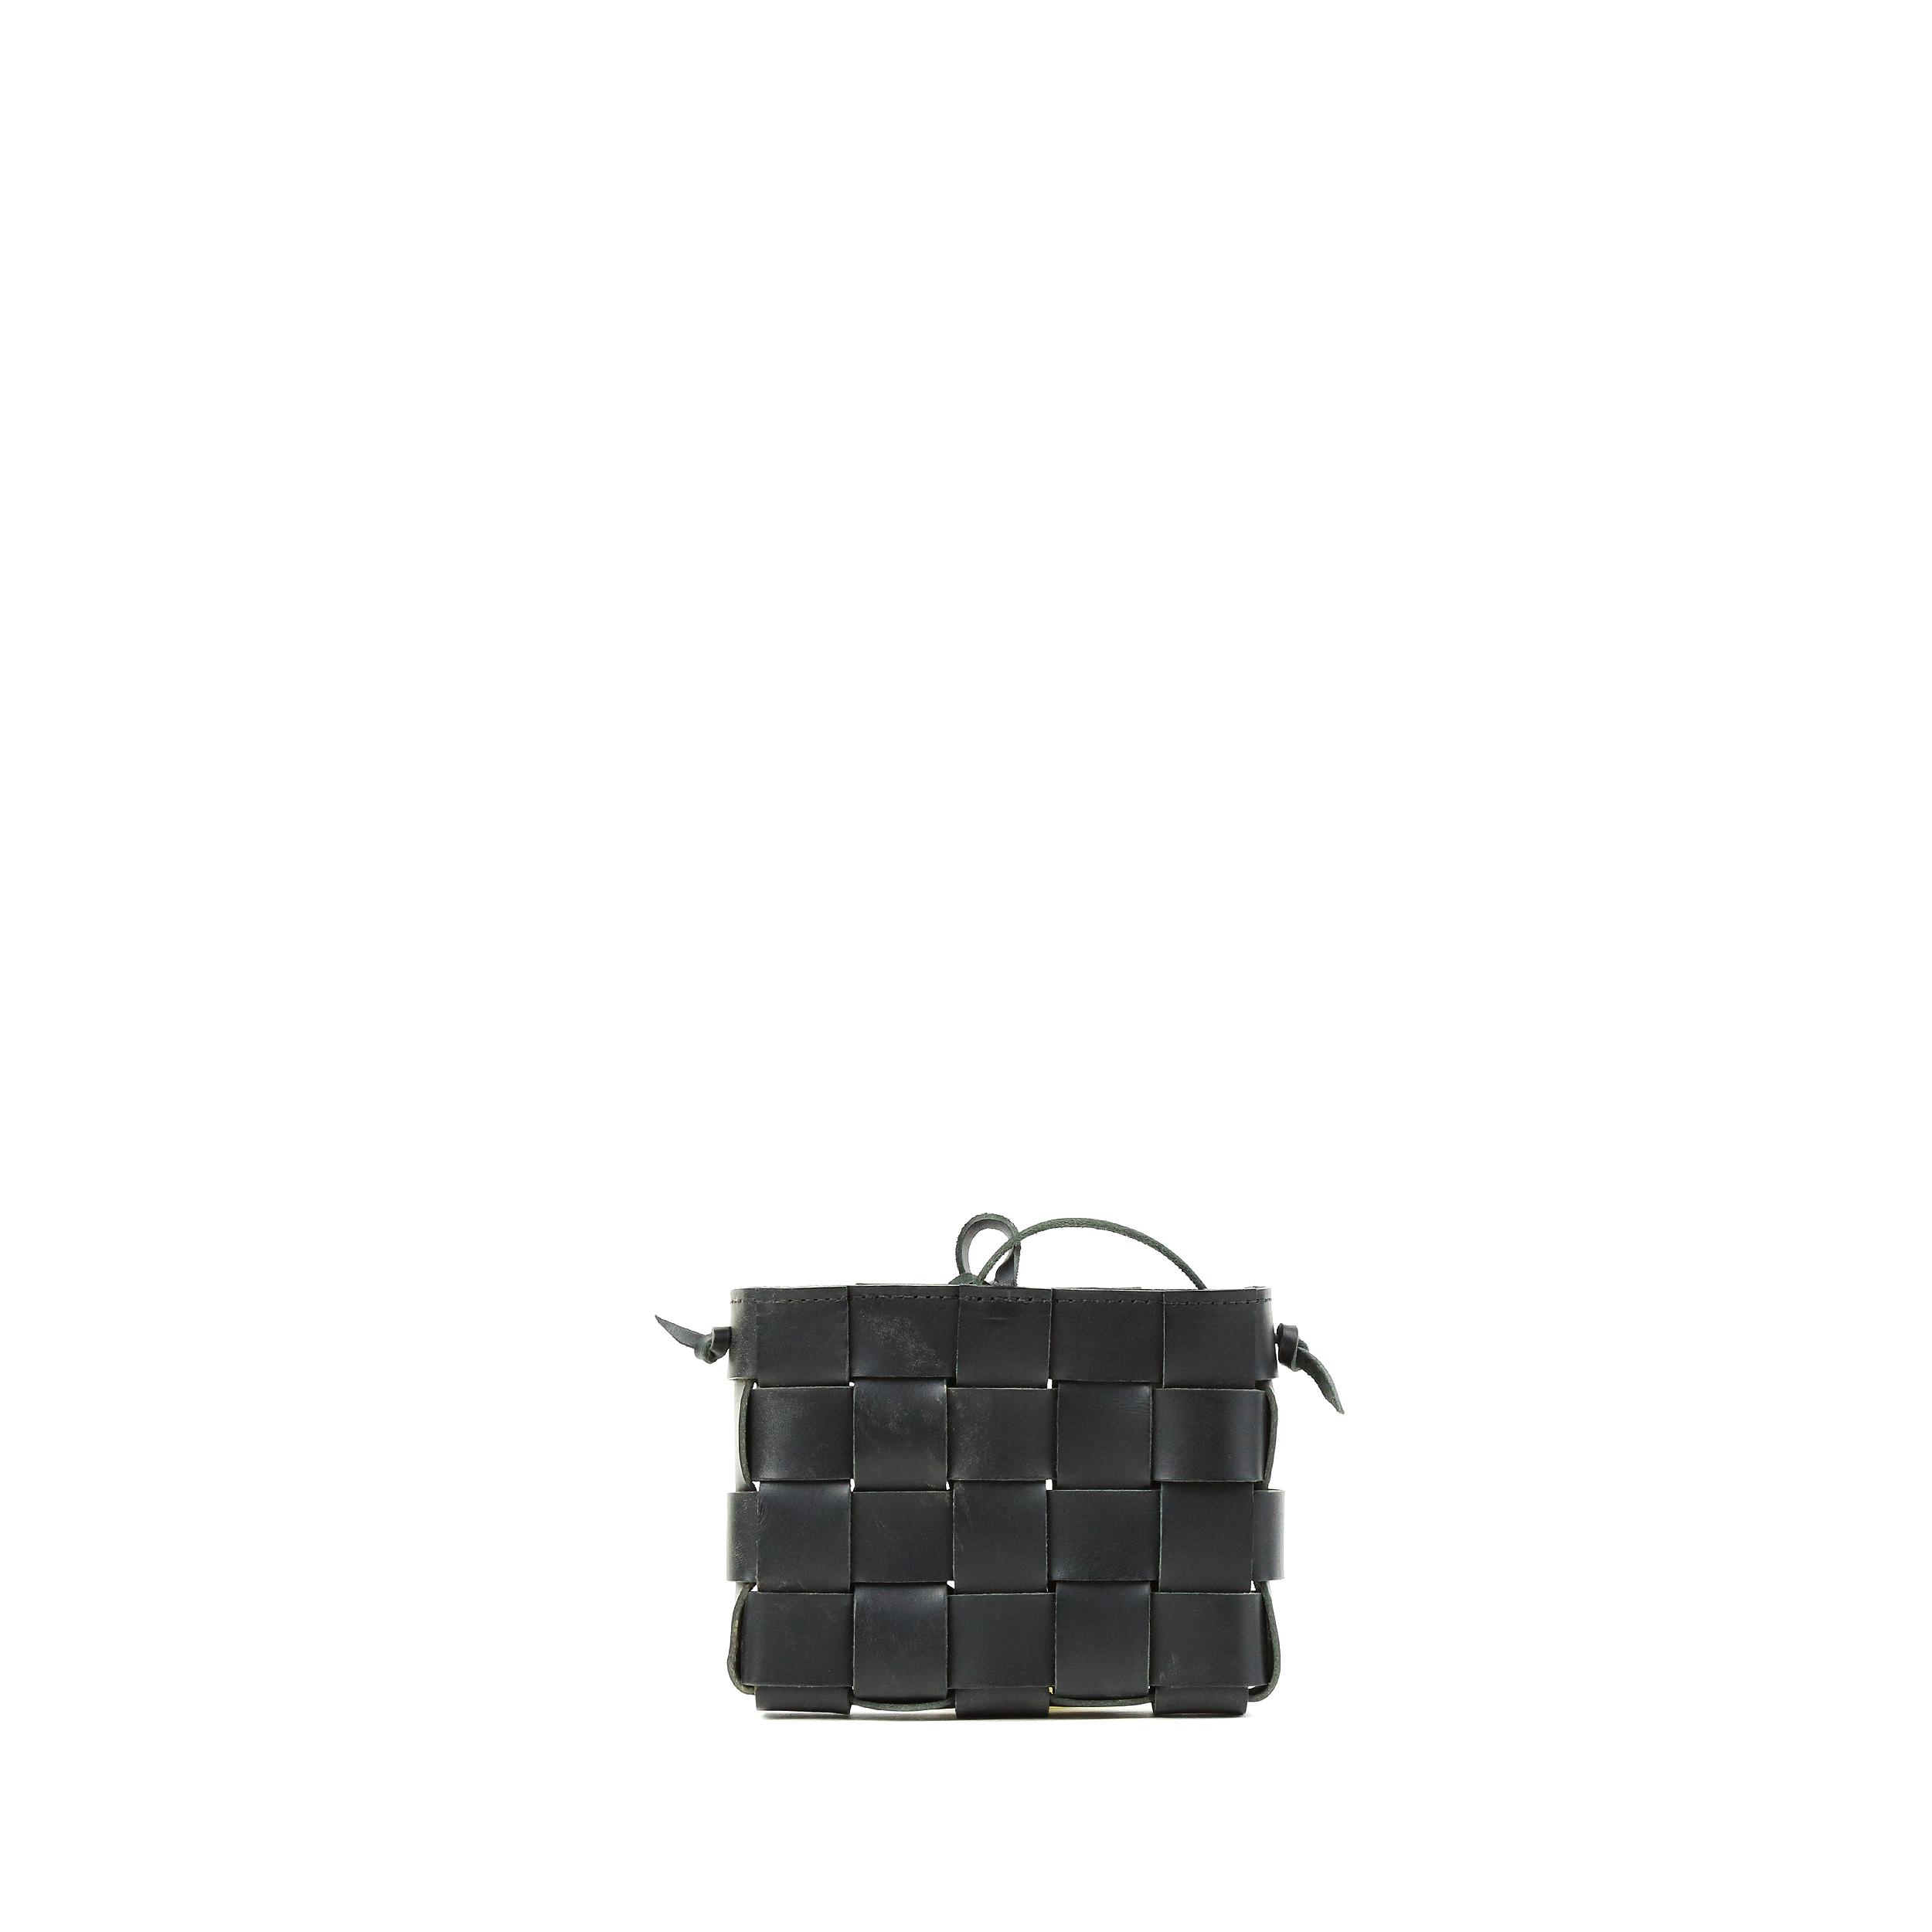 Torba-PANE-Small Crossbody Bag Black-1